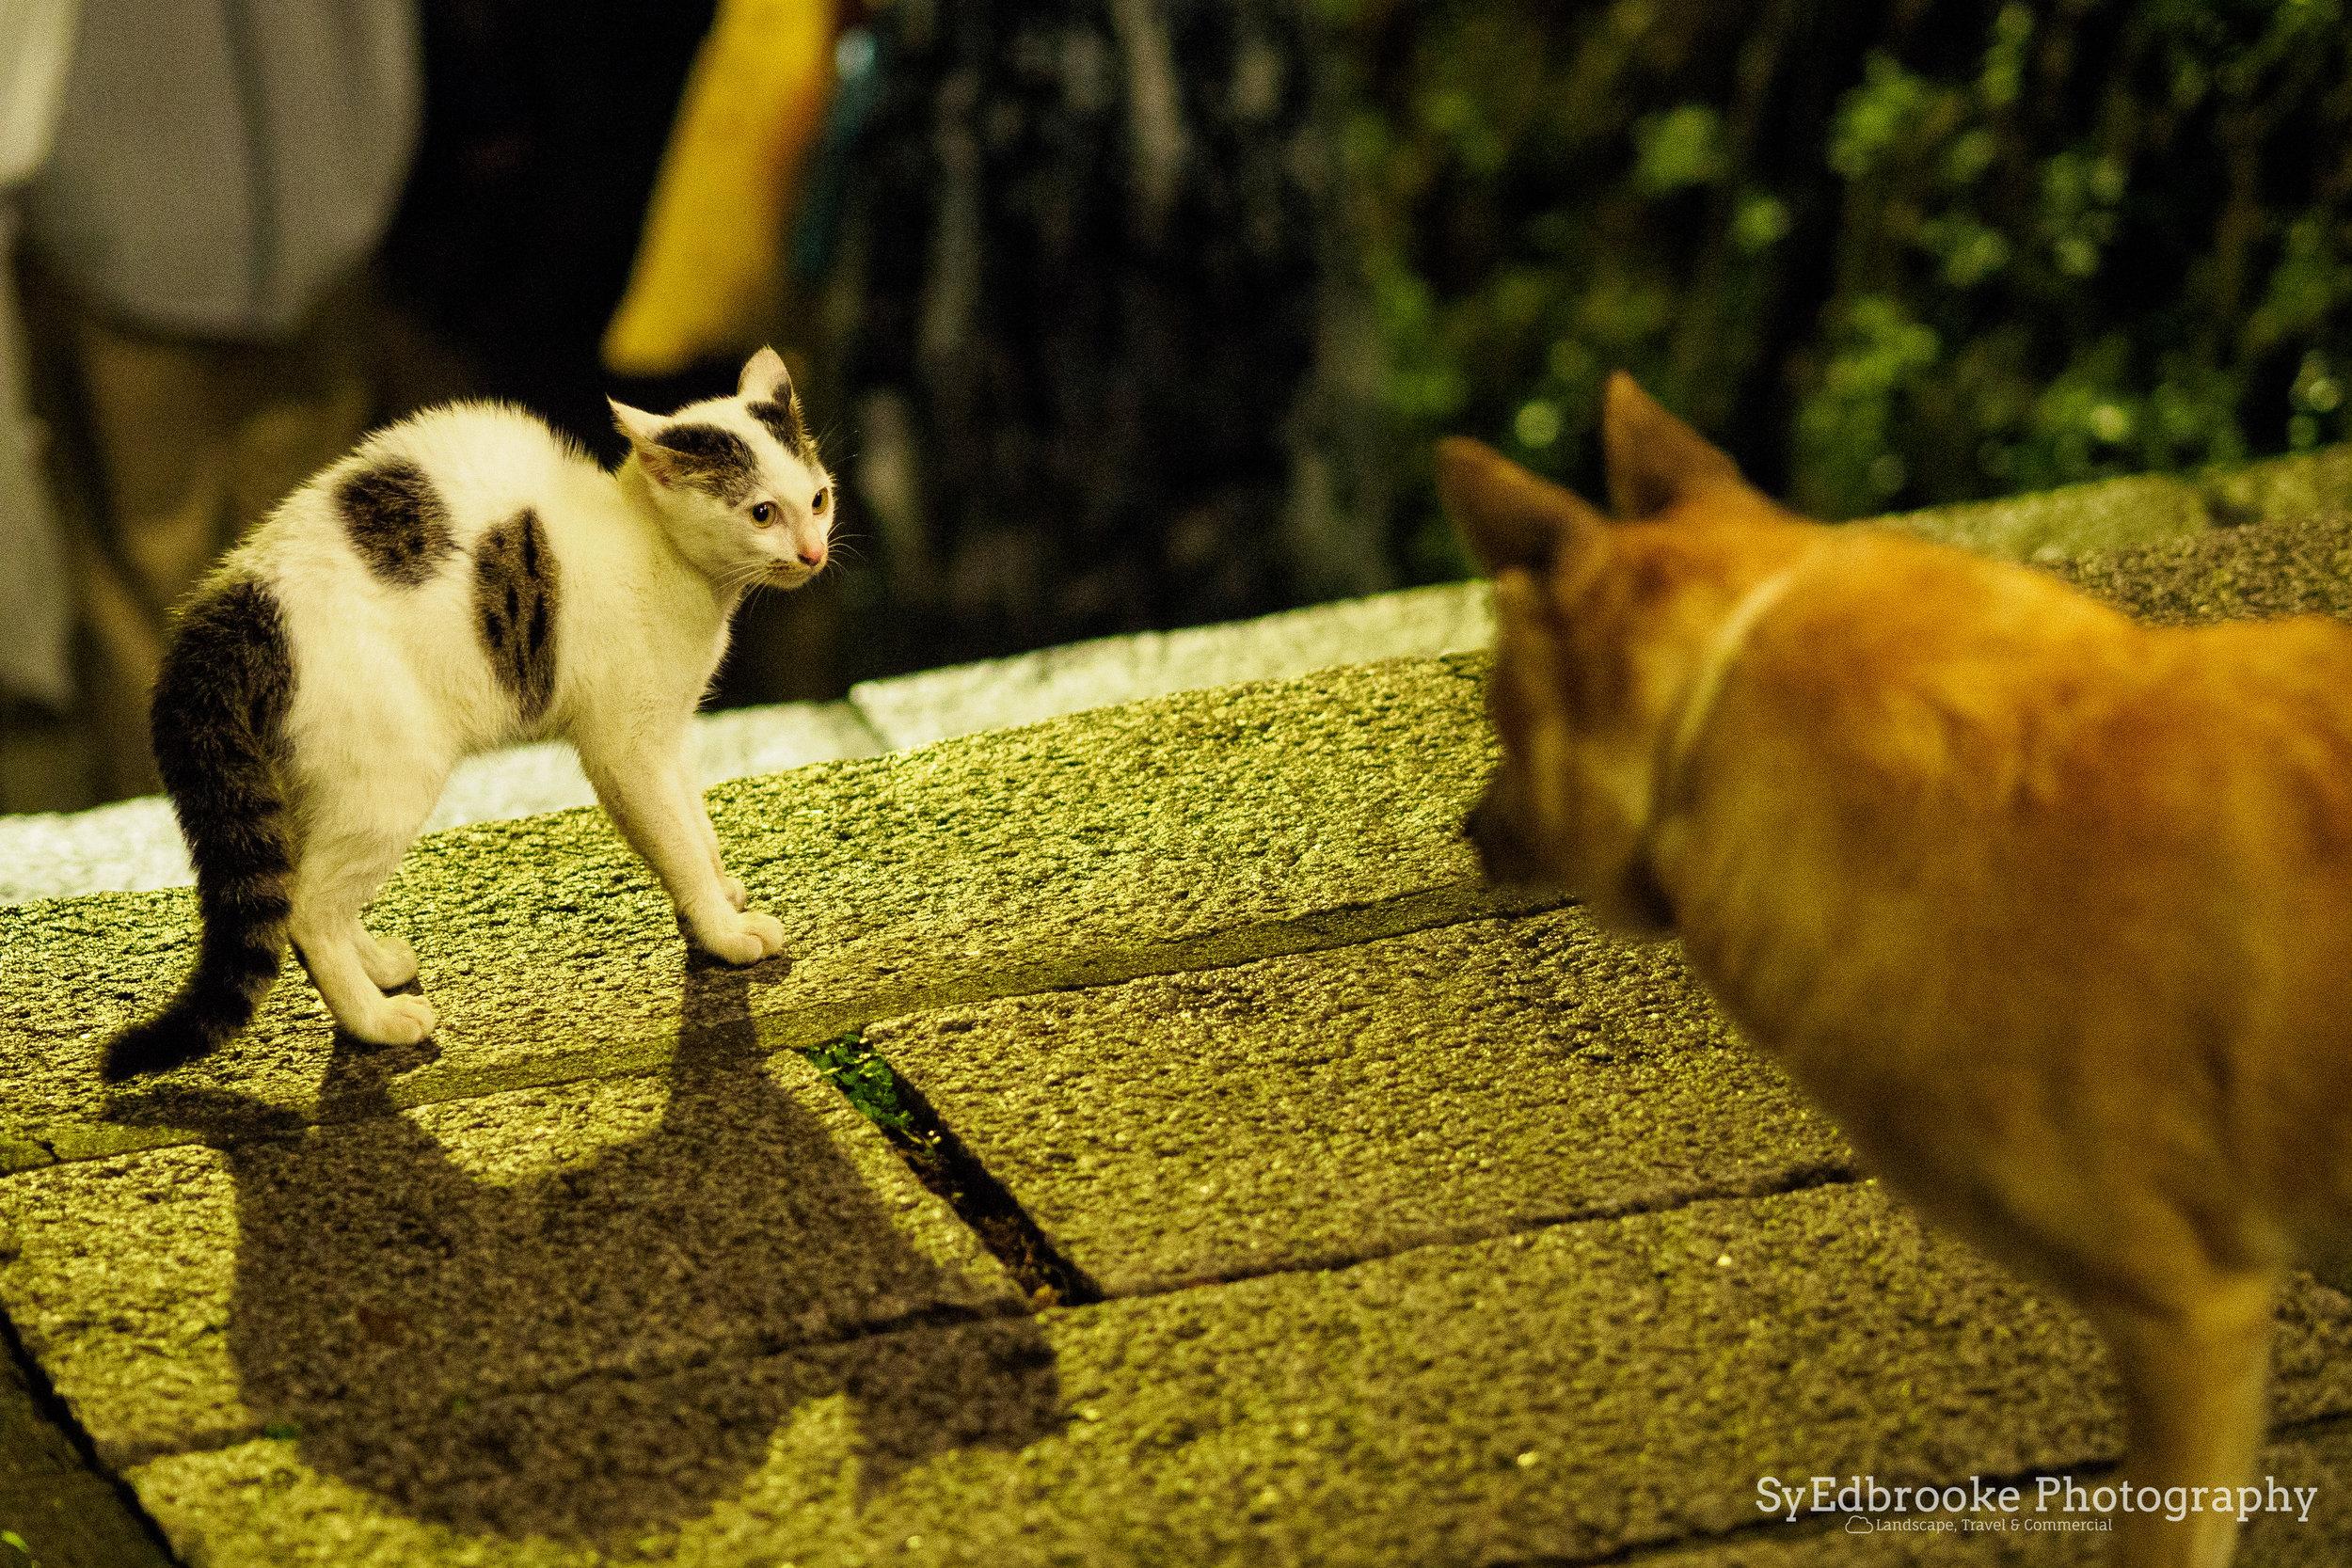 cat meet dog. f1.8, ISO 3200, 1/80, 75mm